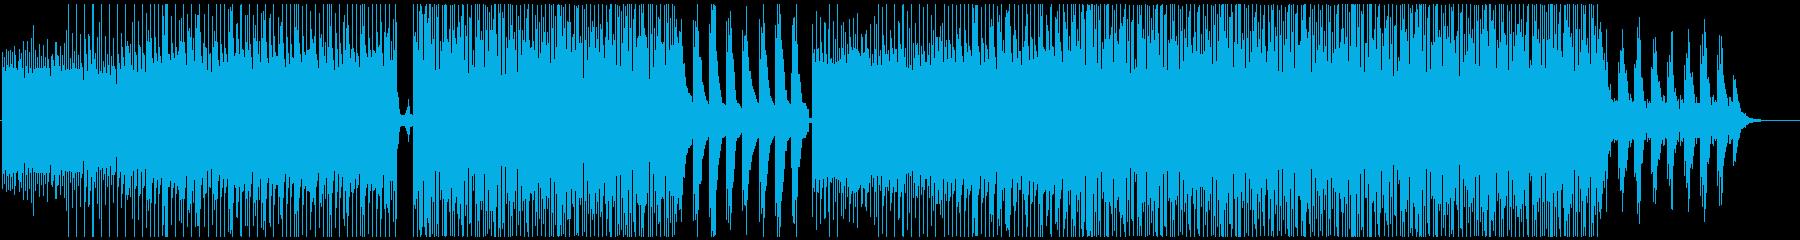 PV-爽やか-明るい-POP-家族-船の再生済みの波形